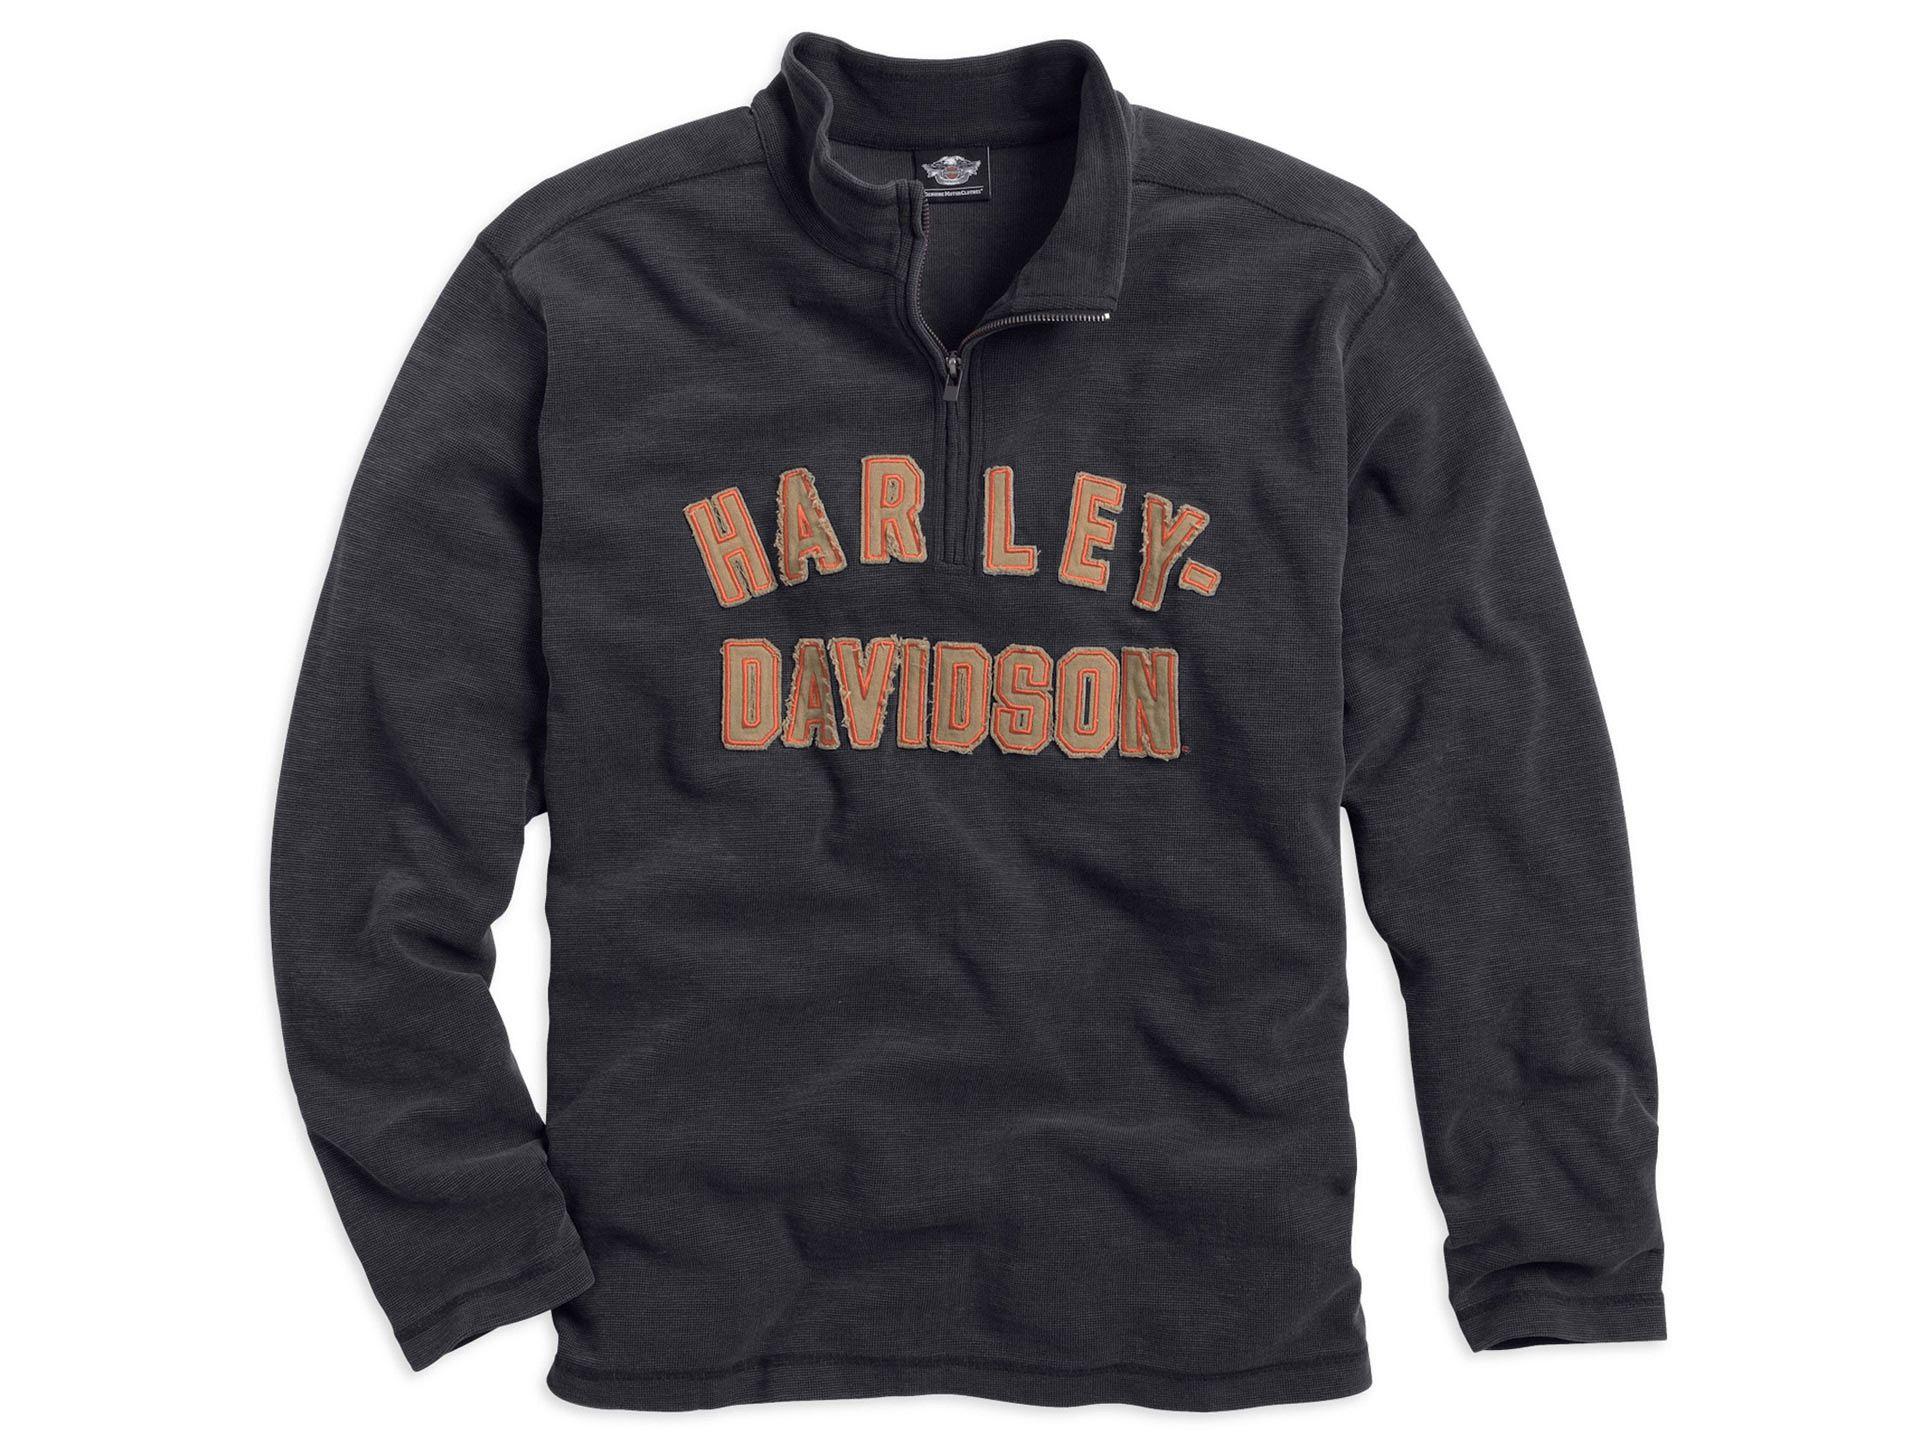 original harley-davidson sweatshirt made of 100% cotton